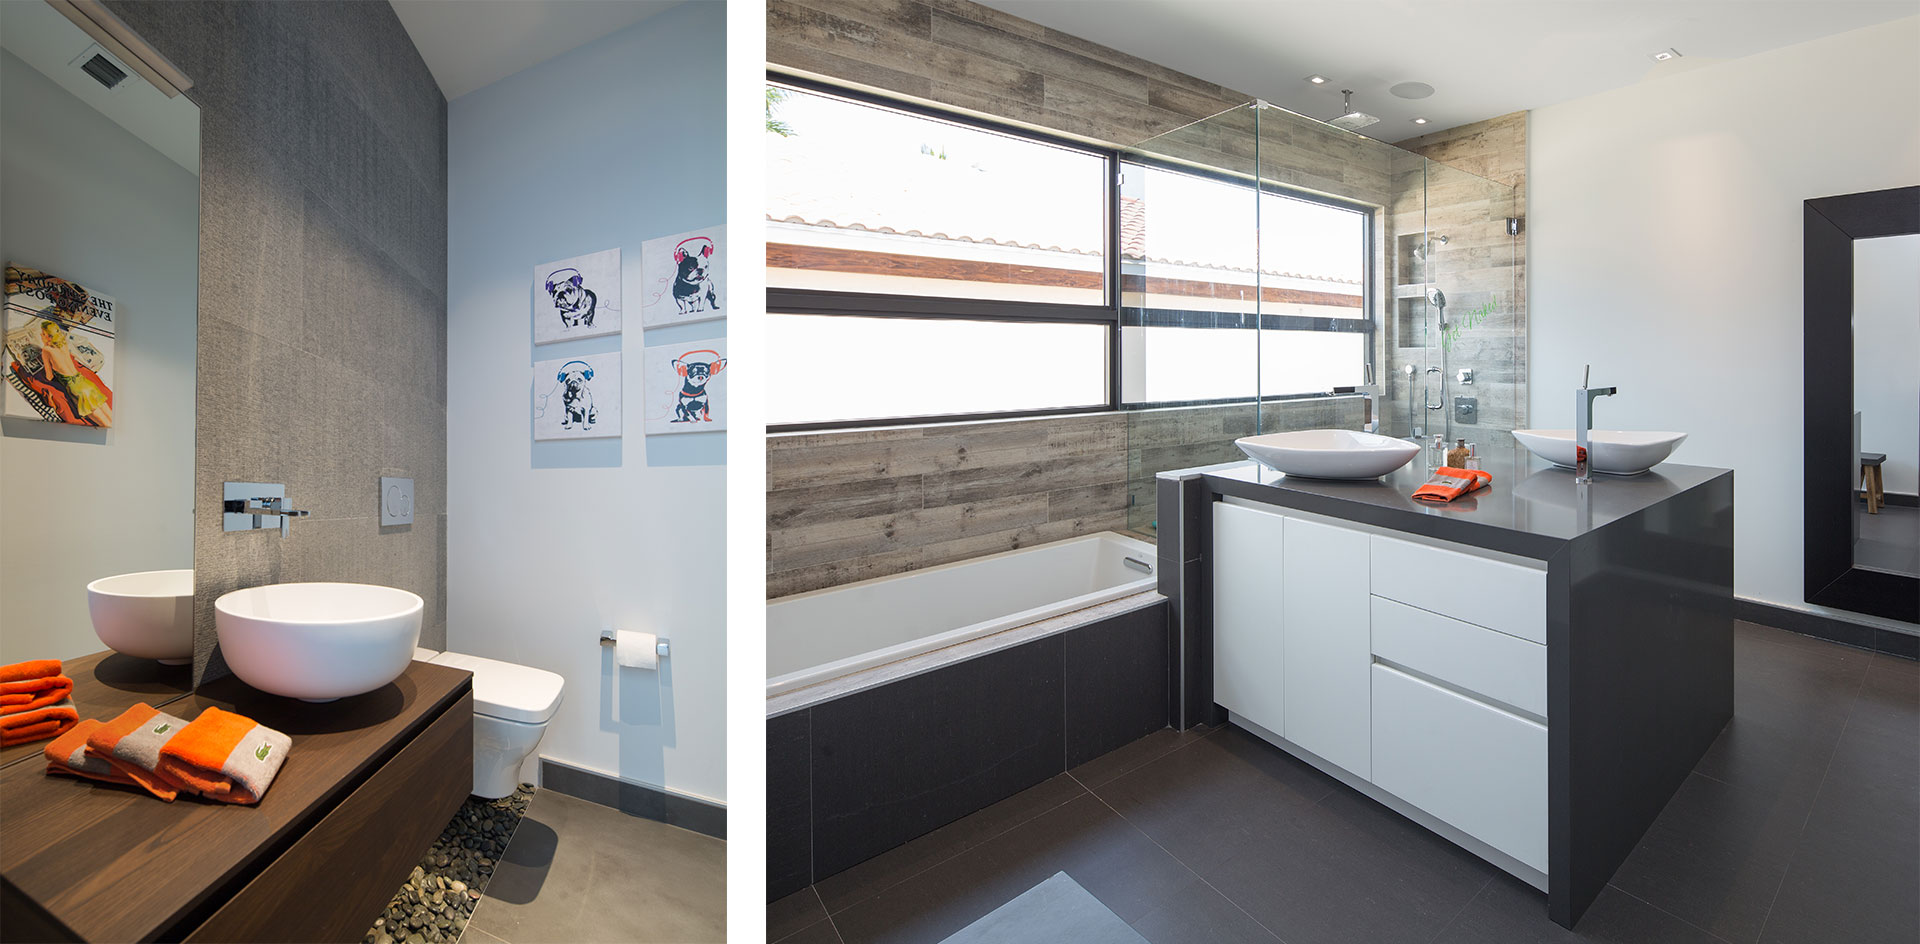 Interior Design bathroom view project in Boca Raton, Florida